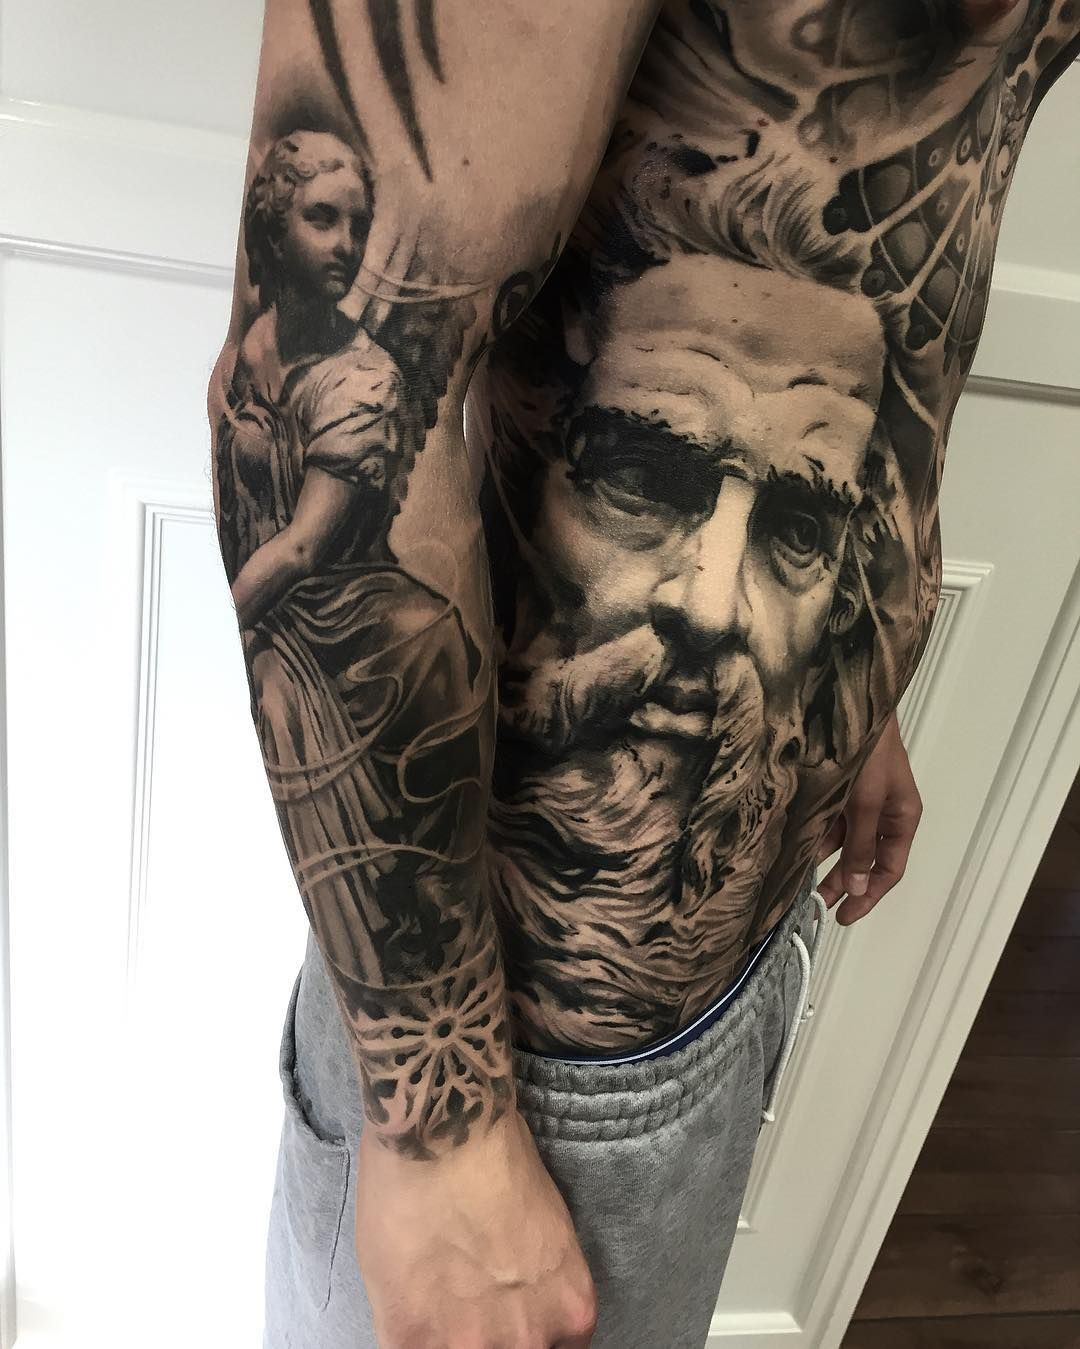 Tattoo Ideas Realism: Realistic Tattoo By Mark Wosgerau